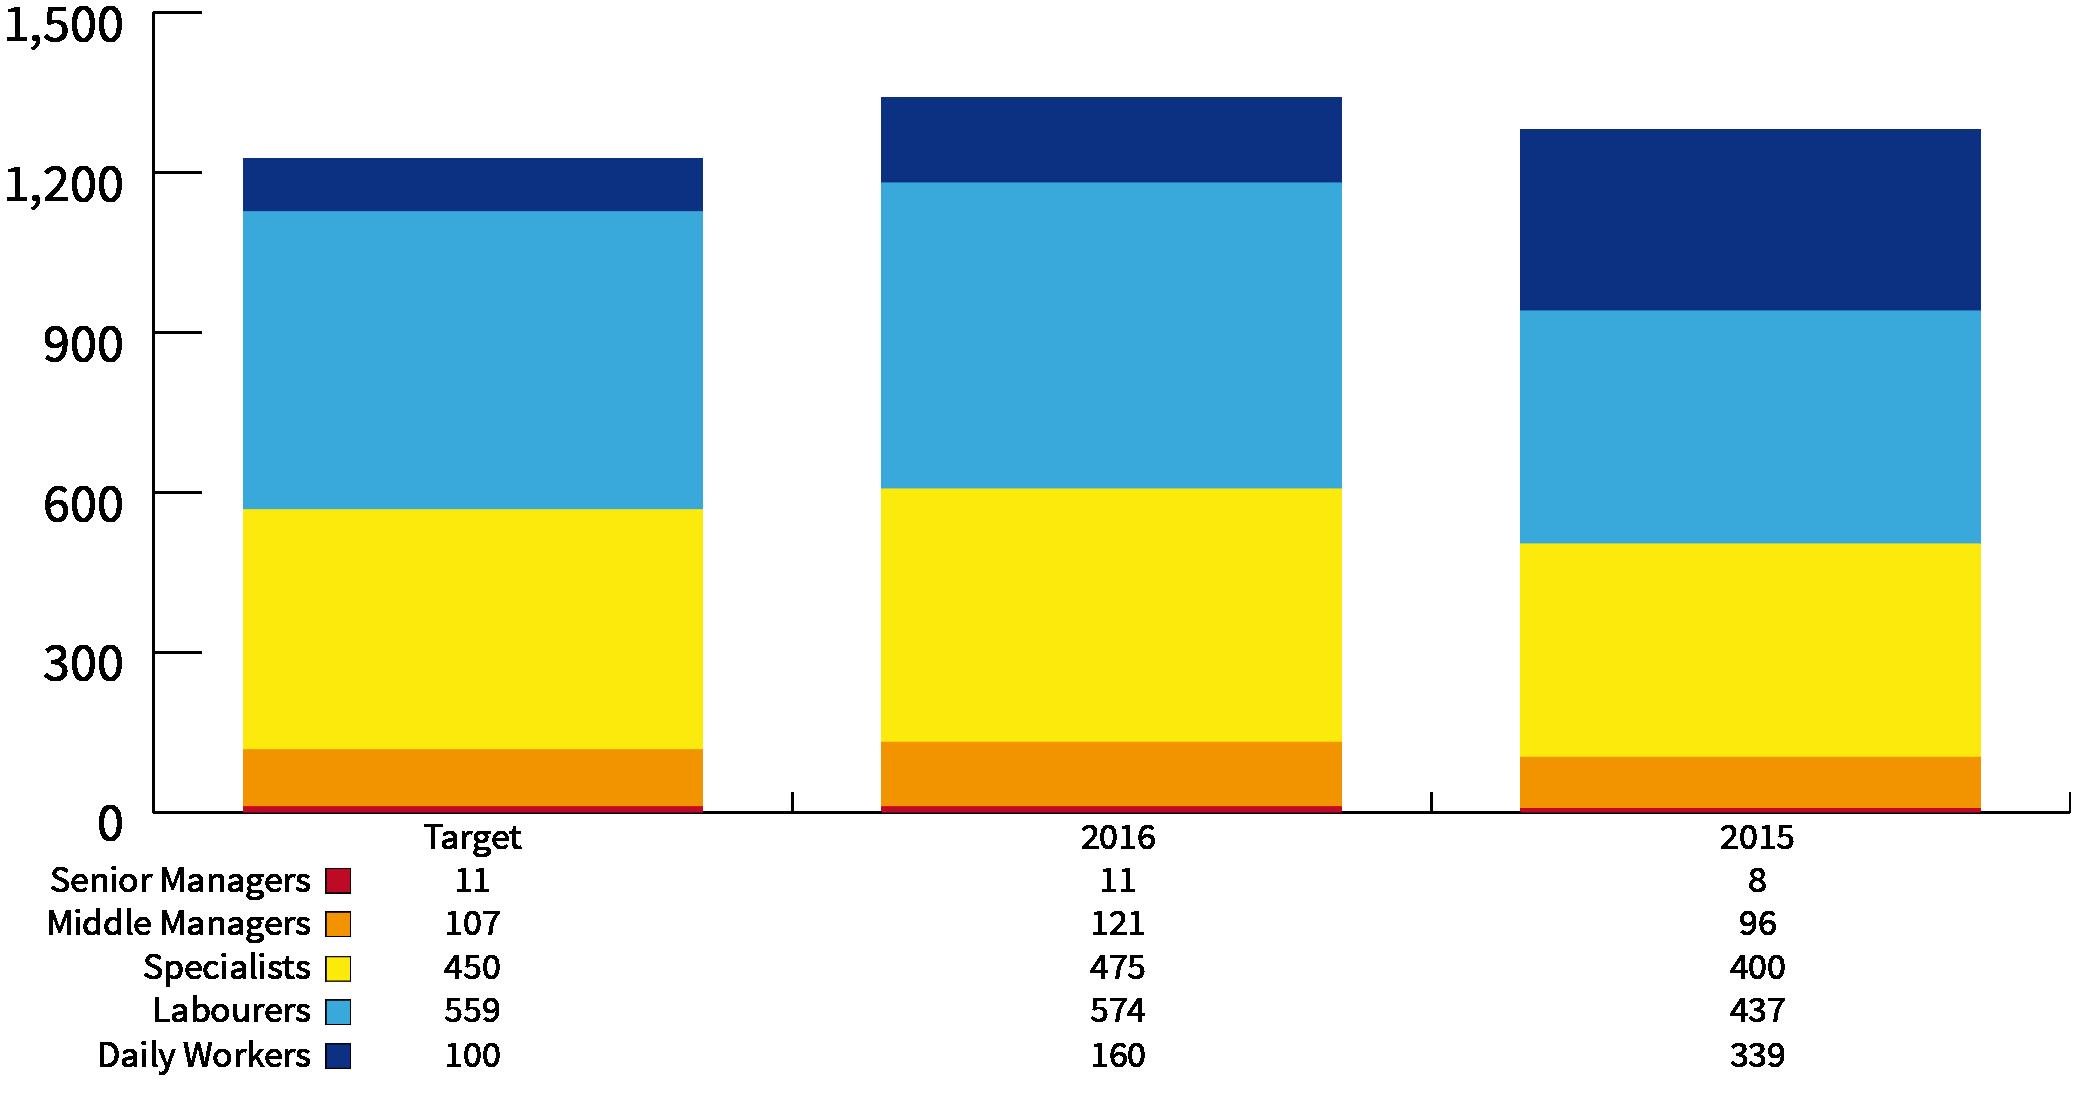 Societal Indicators - Employee Numbers - SEKEM Sustainability Report 2016